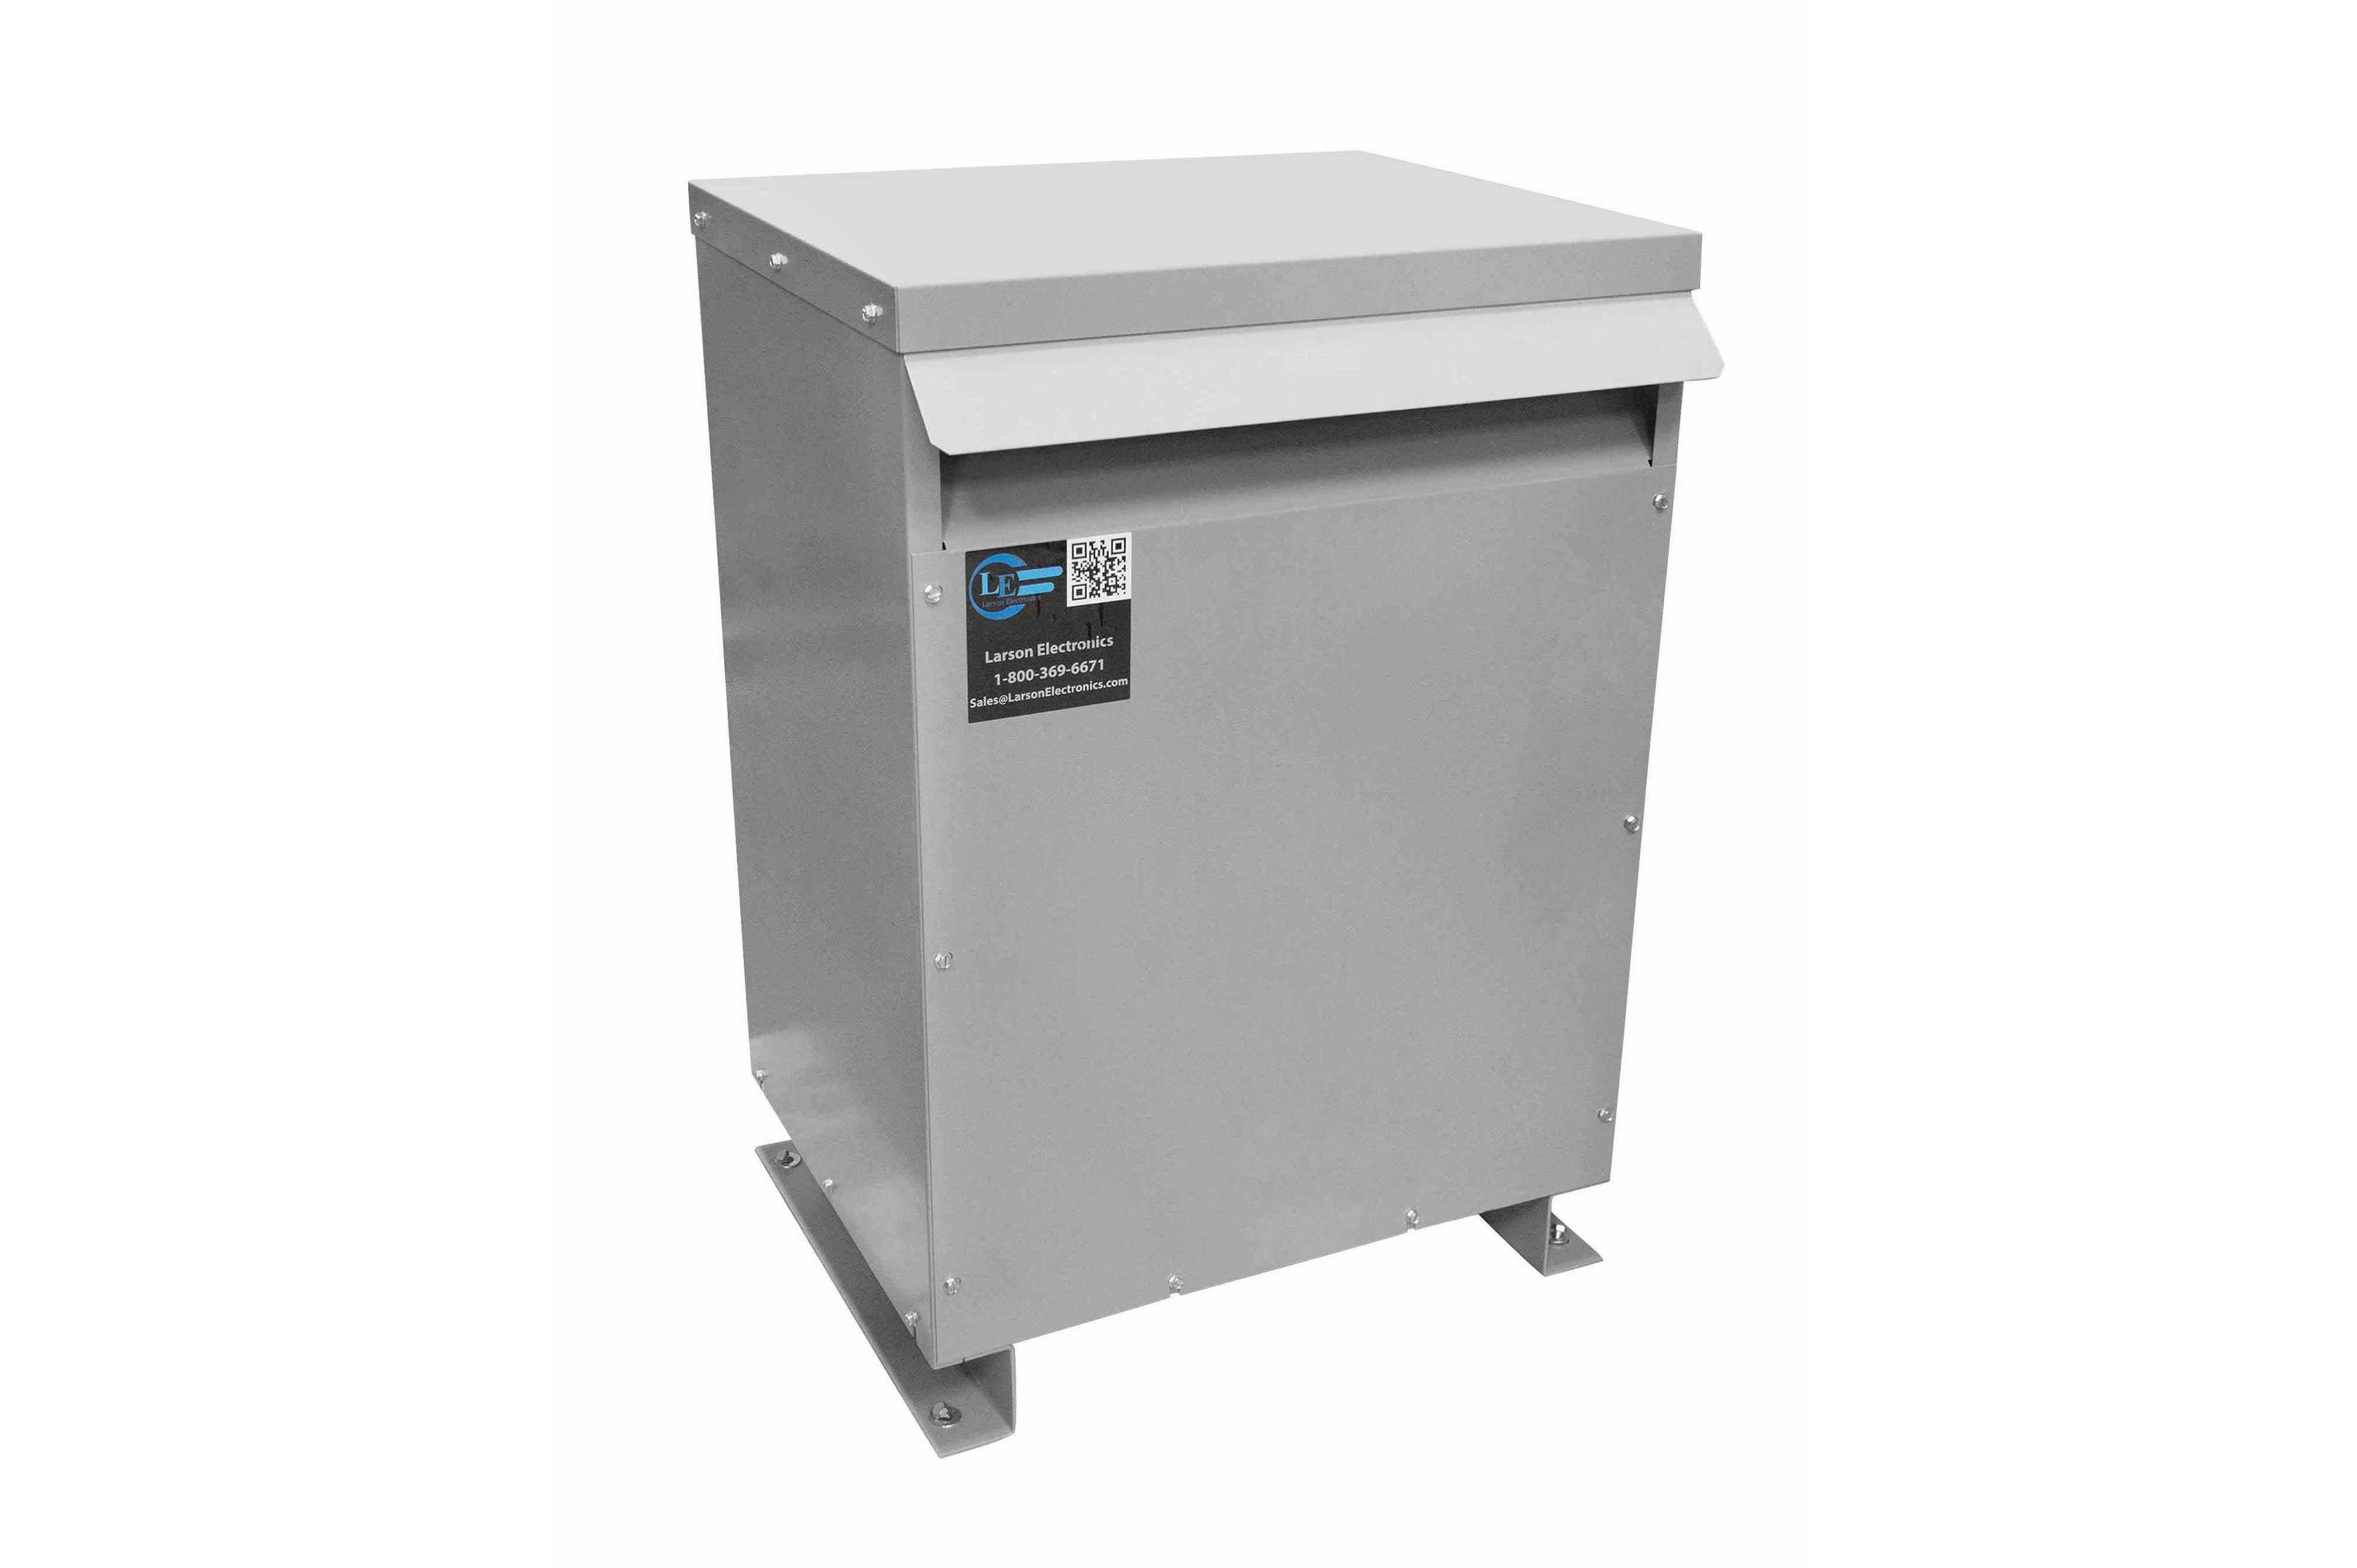 13 kVA 3PH Isolation Transformer, 240V Wye Primary, 600V Delta Secondary, N3R, Ventilated, 60 Hz